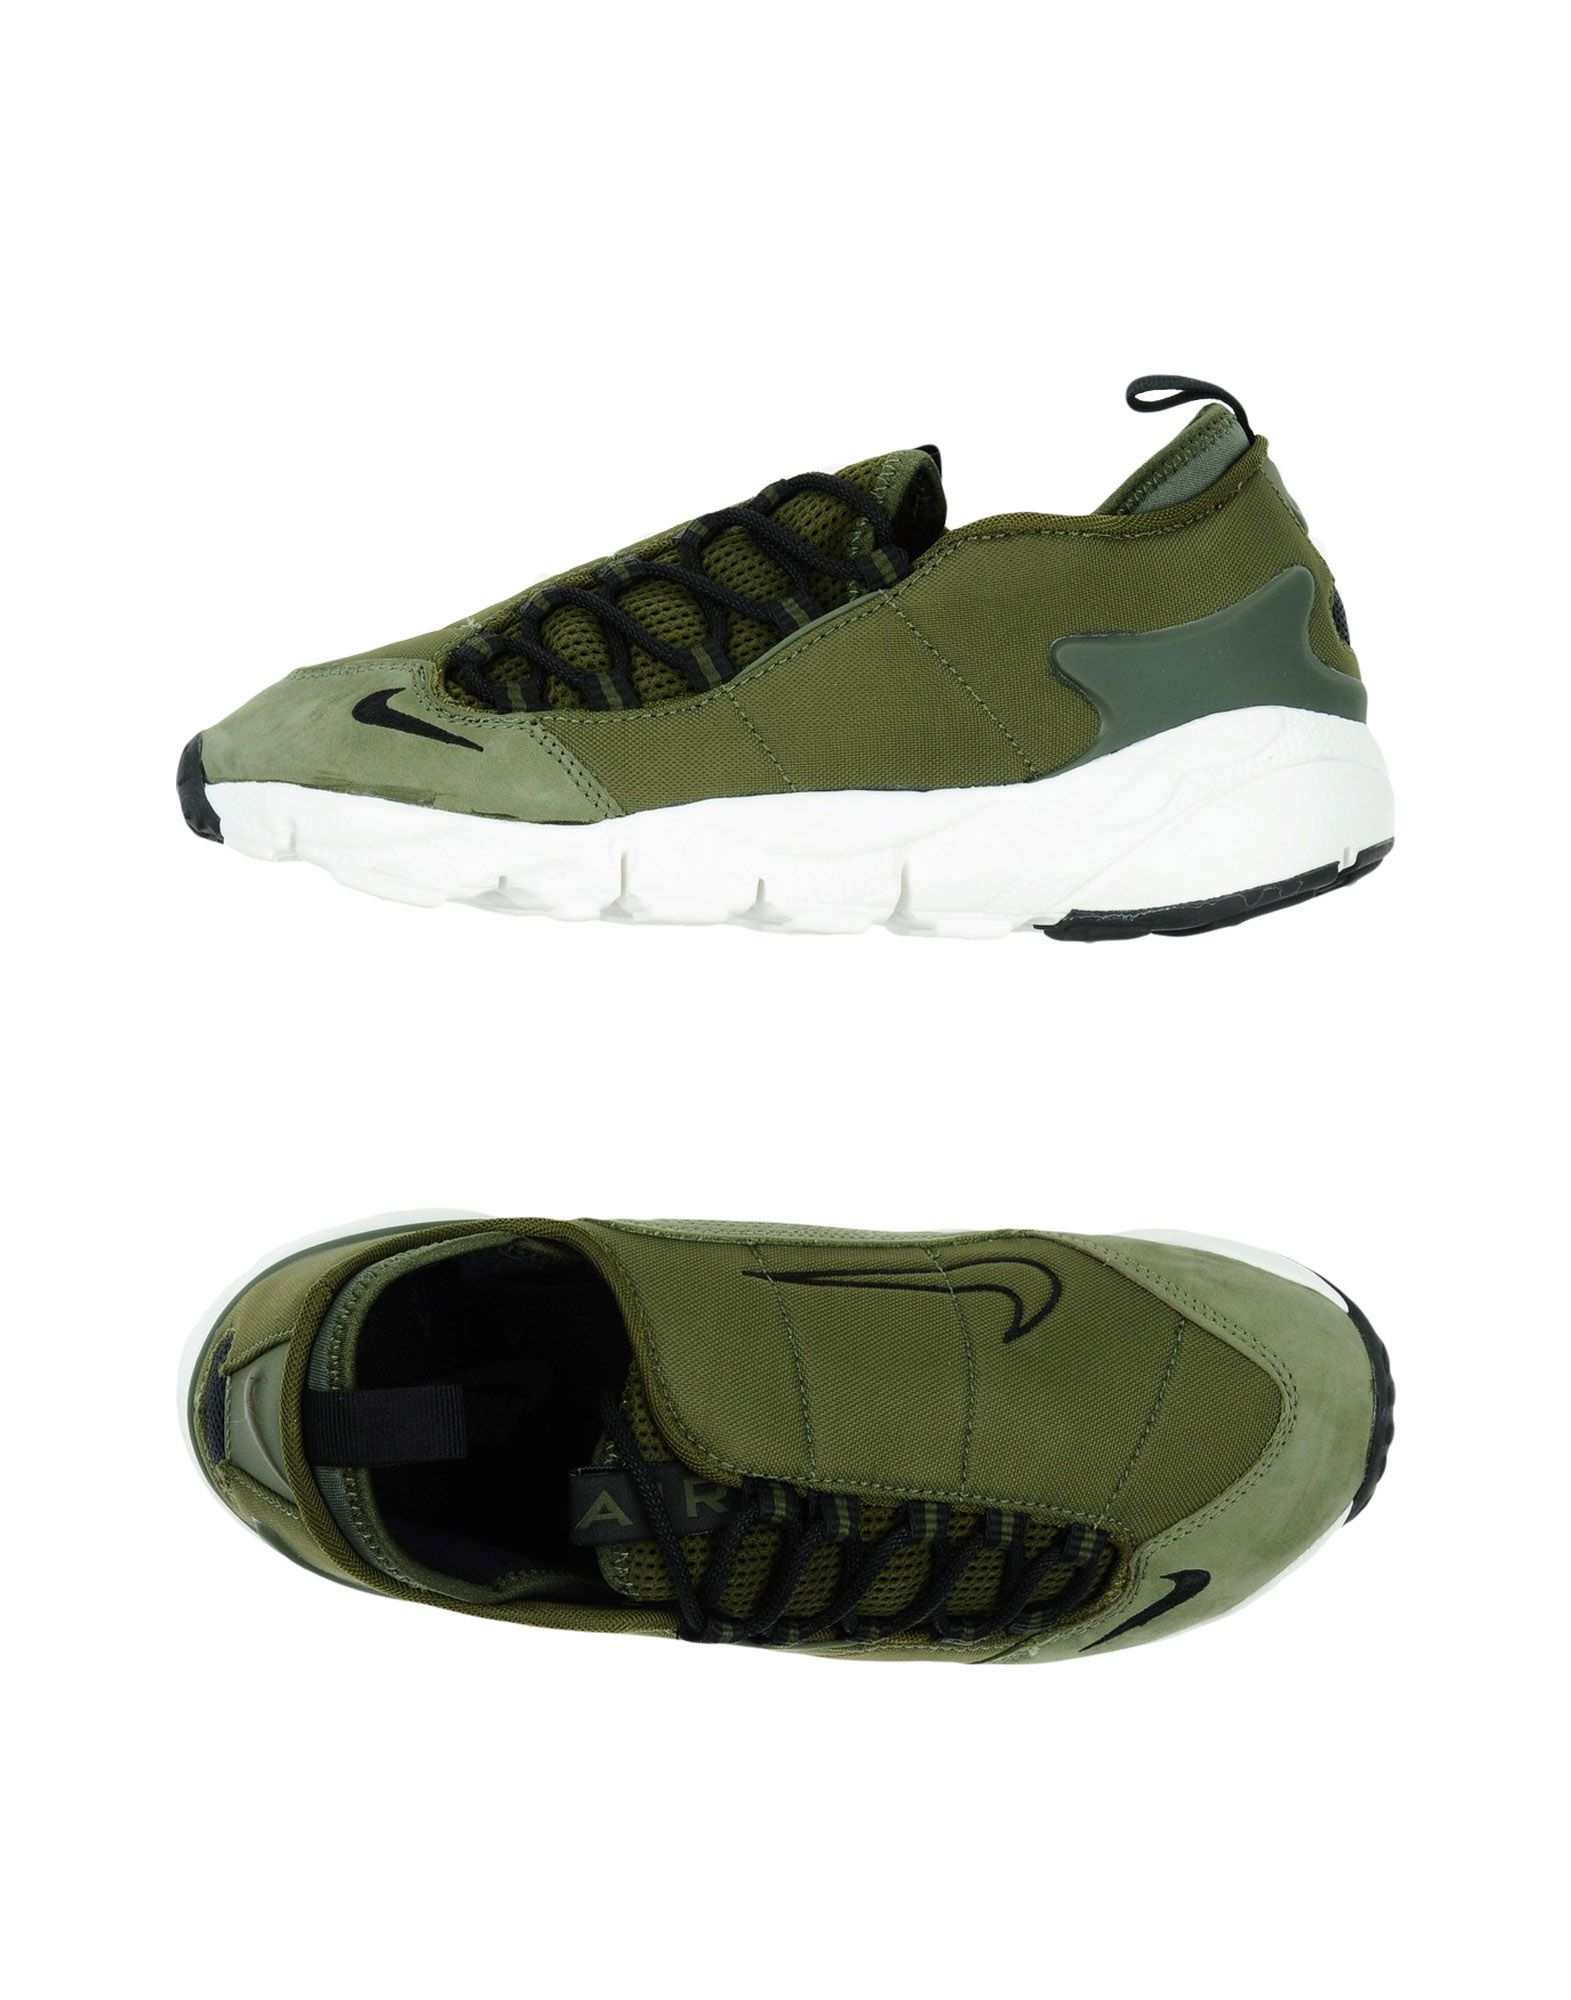 Moda Scarpe - da Ginnastica Nike Uomo - Scarpe 11335574FX b2eec5